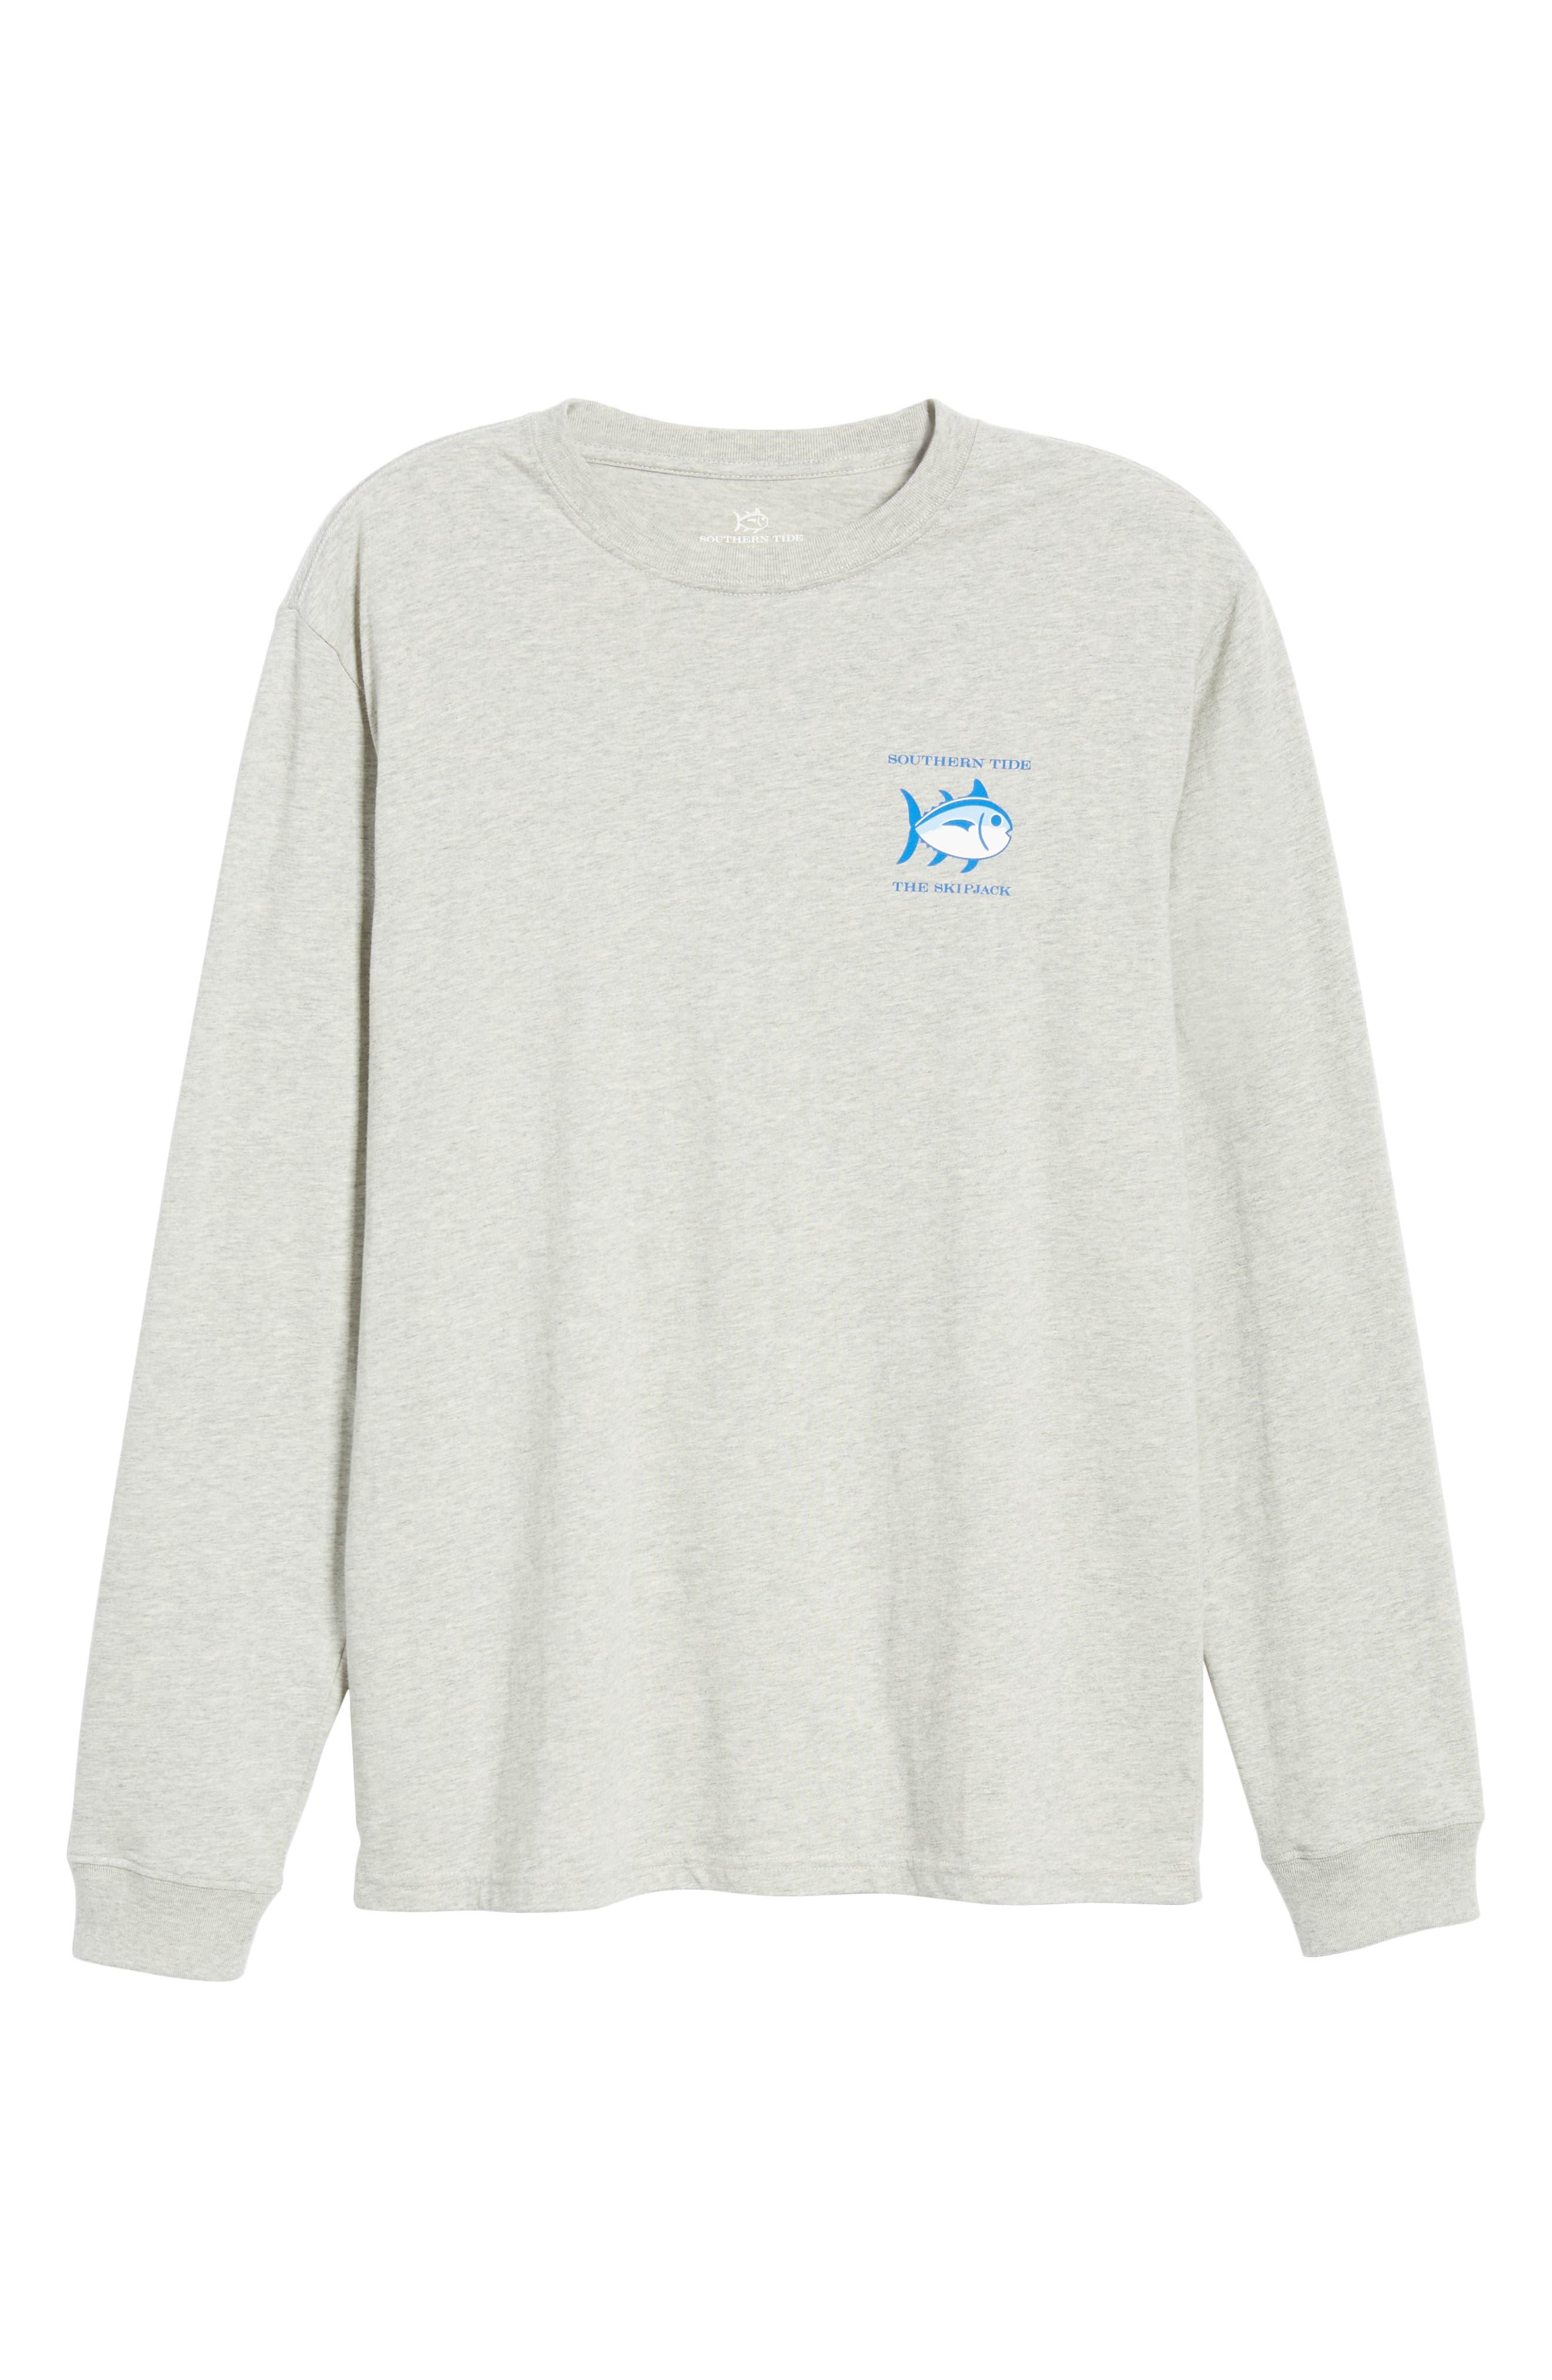 Original Skipjack T-Shirt,                             Alternate thumbnail 6, color,                             LIGHT GREY